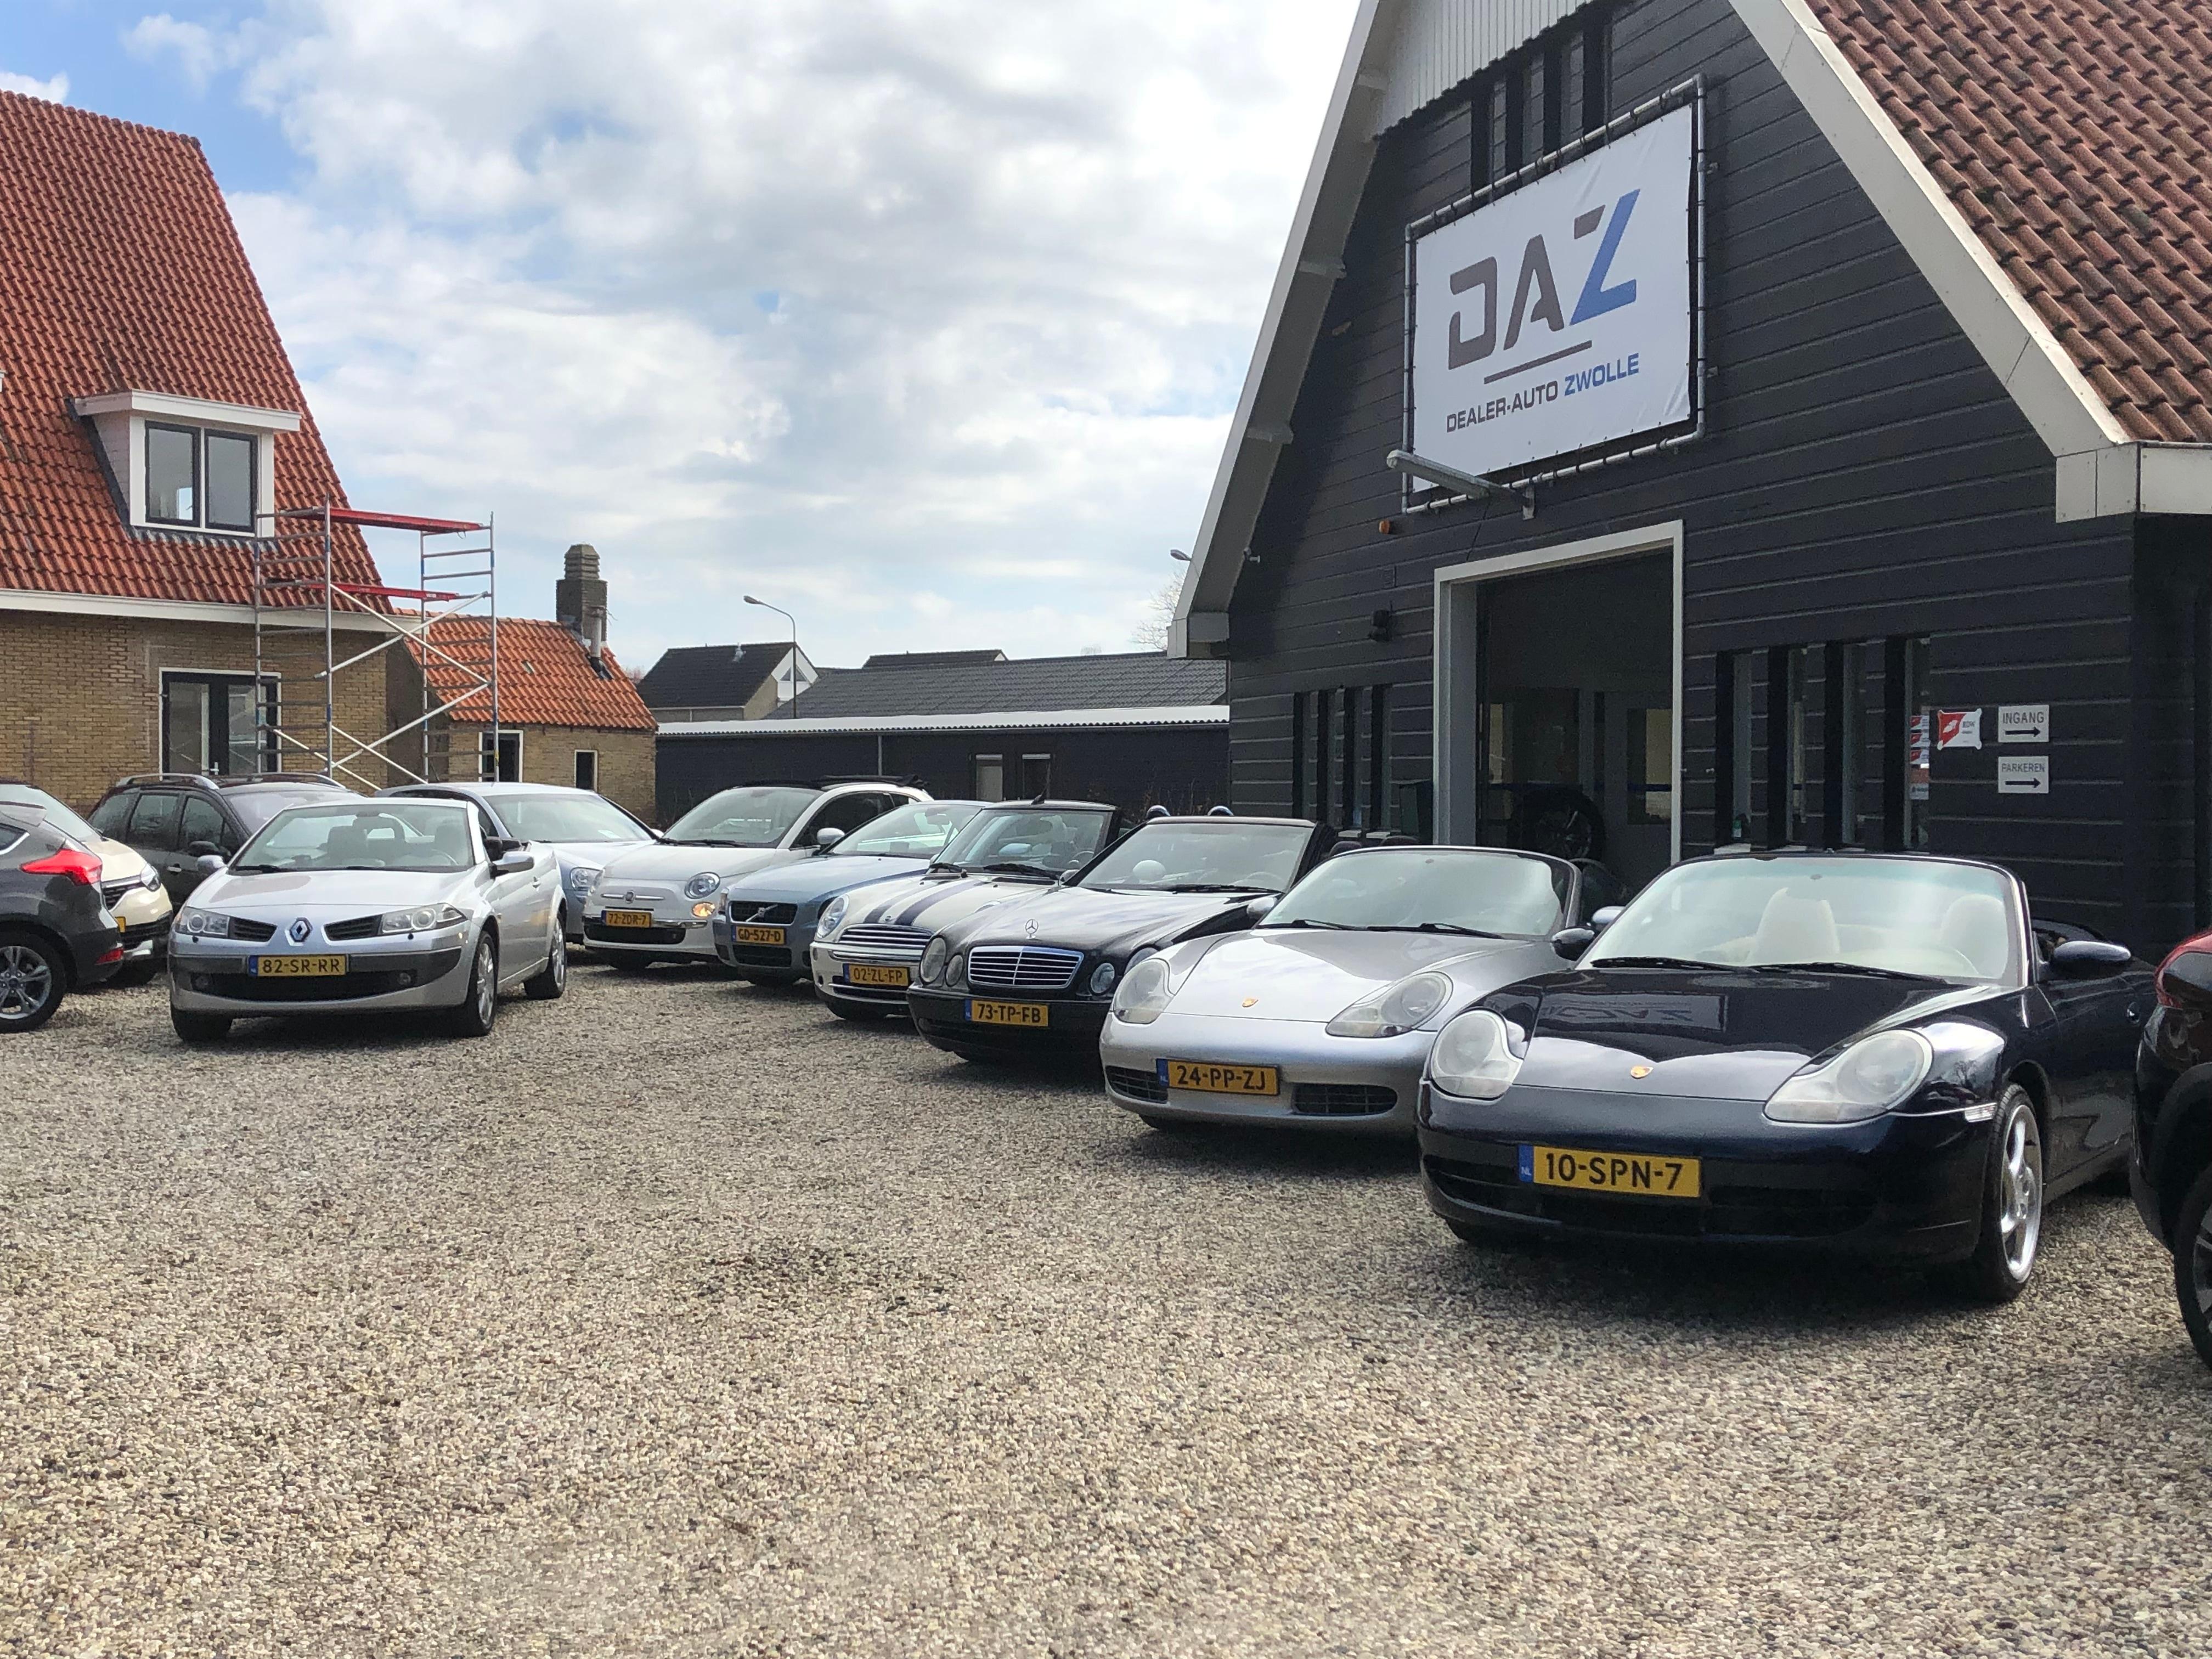 Dealer-Auto Zwolle